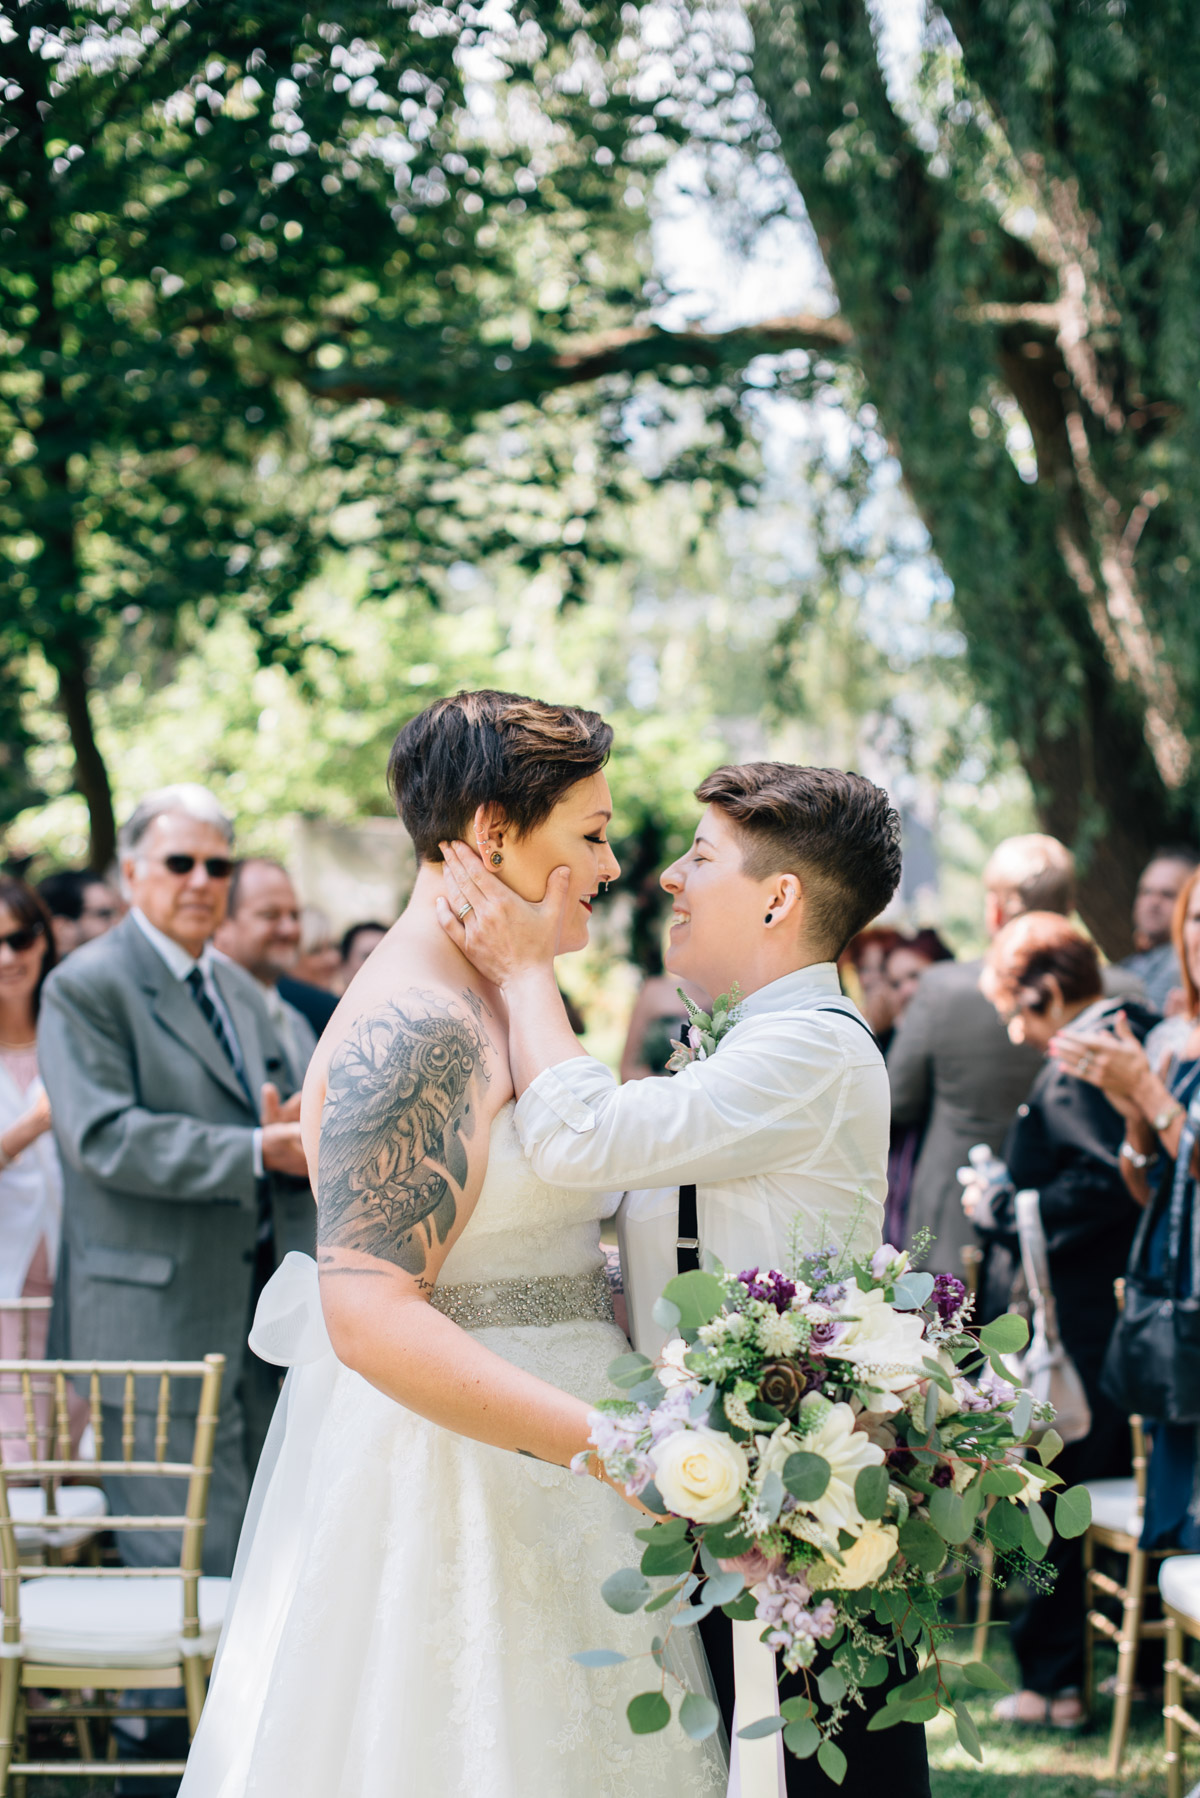 sara-wilde-photography-vineyard-bride-swish-list-beamer-falls-manor-grimsby-wedding-33.jpg